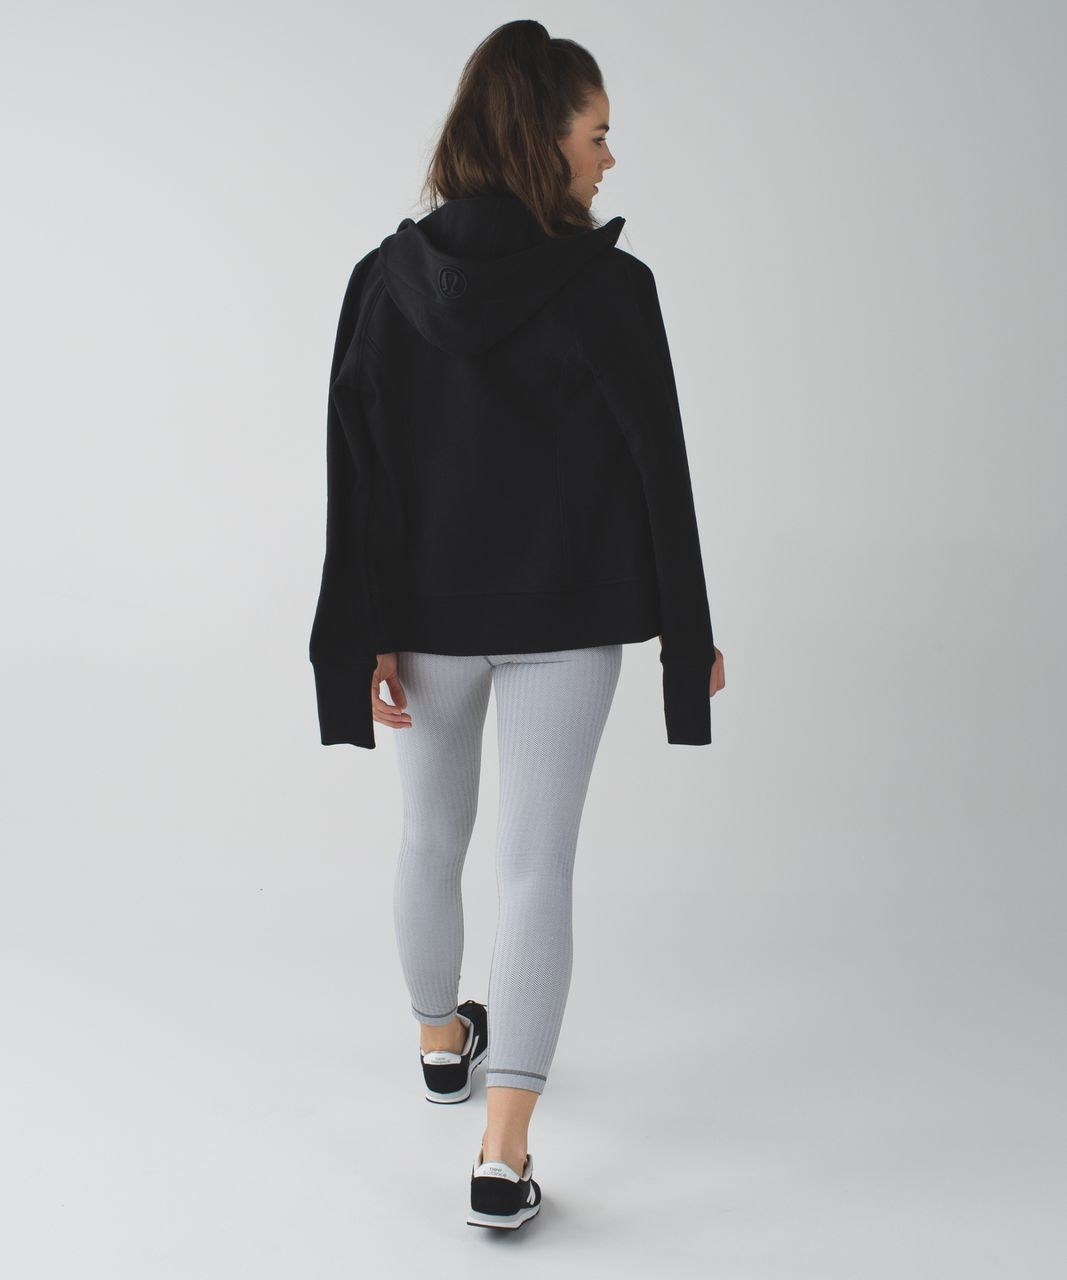 Lululemon High Times Pant - Heathered Herringbone Heathered White Slate